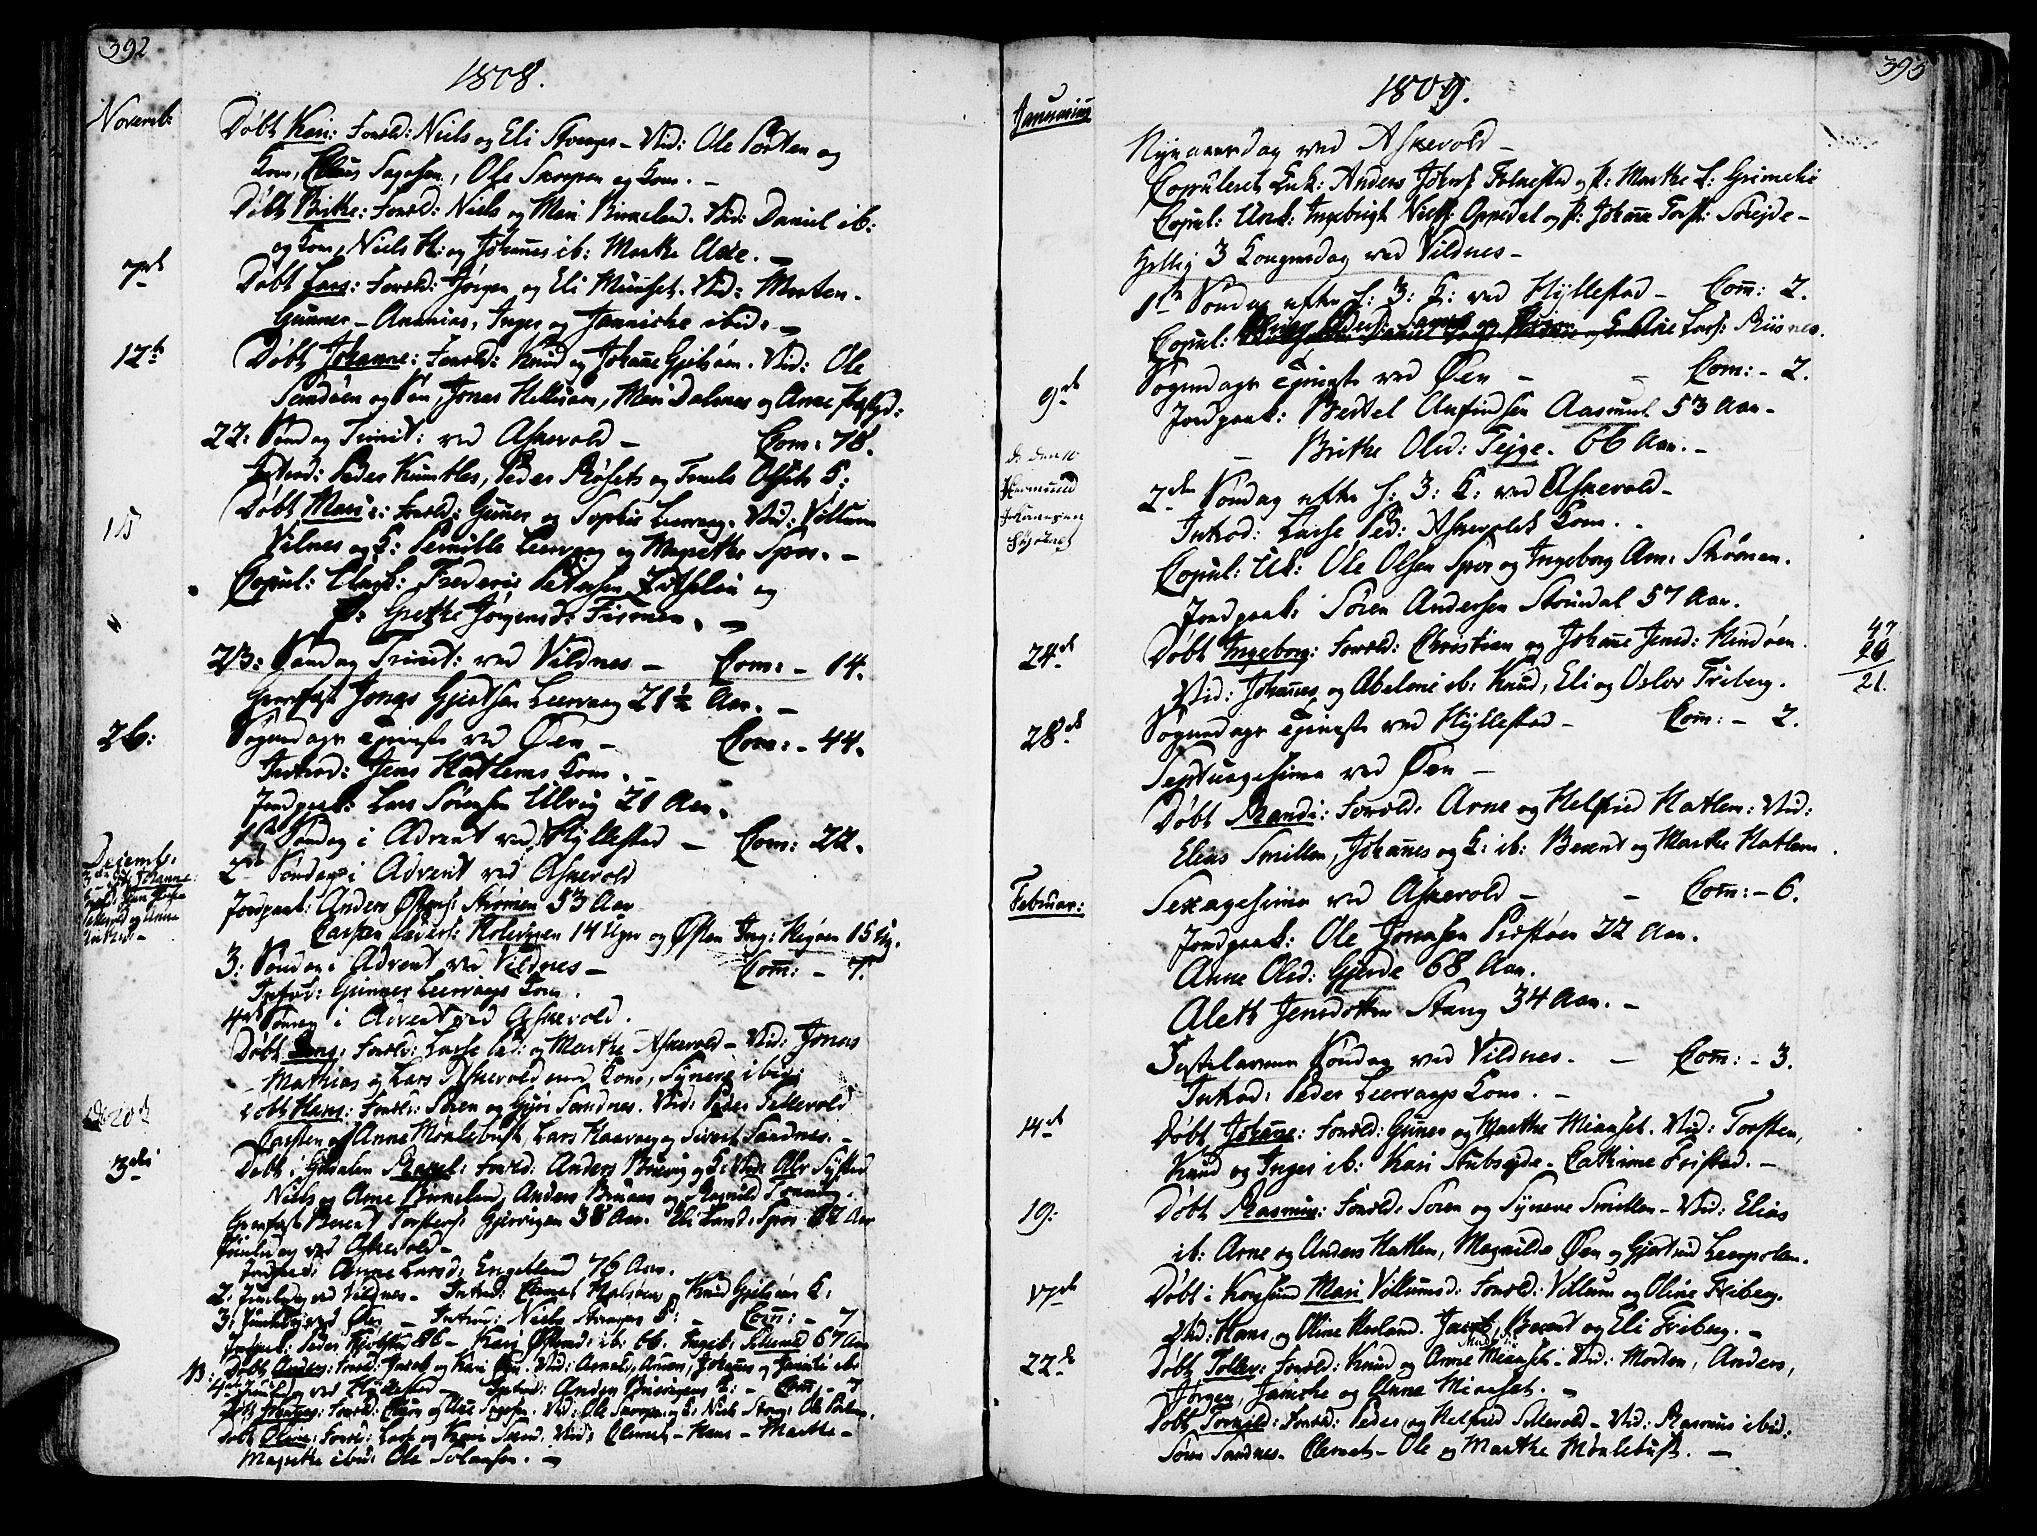 SAB, Askvoll sokneprestembete, H/Haa/Haaa/L0009: Ministerialbok nr. A 9, 1776-1821, s. 392-393